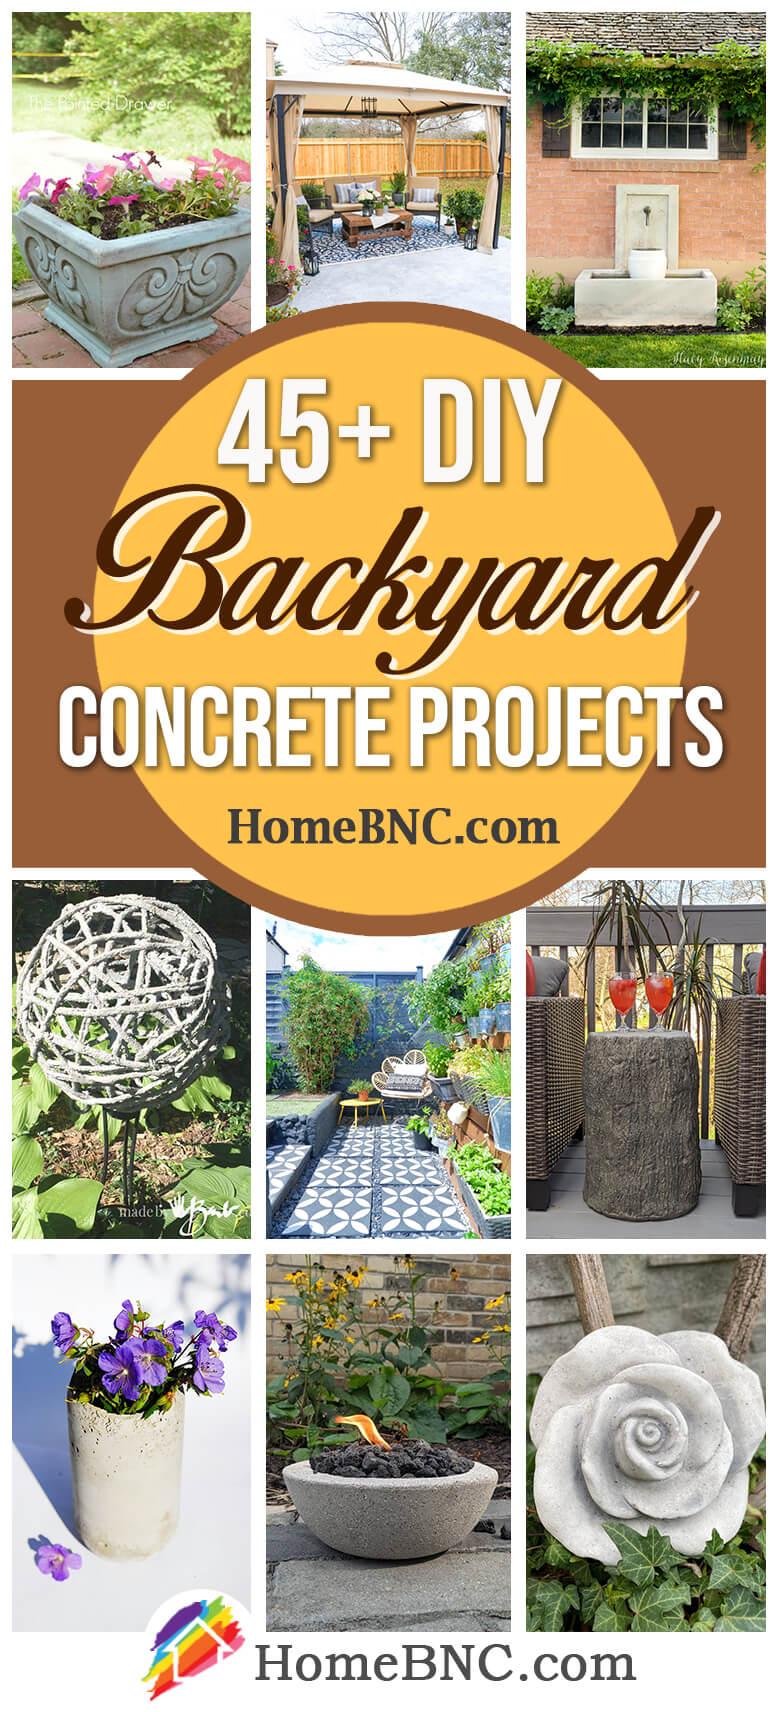 DIY Backyard Concrete Projects